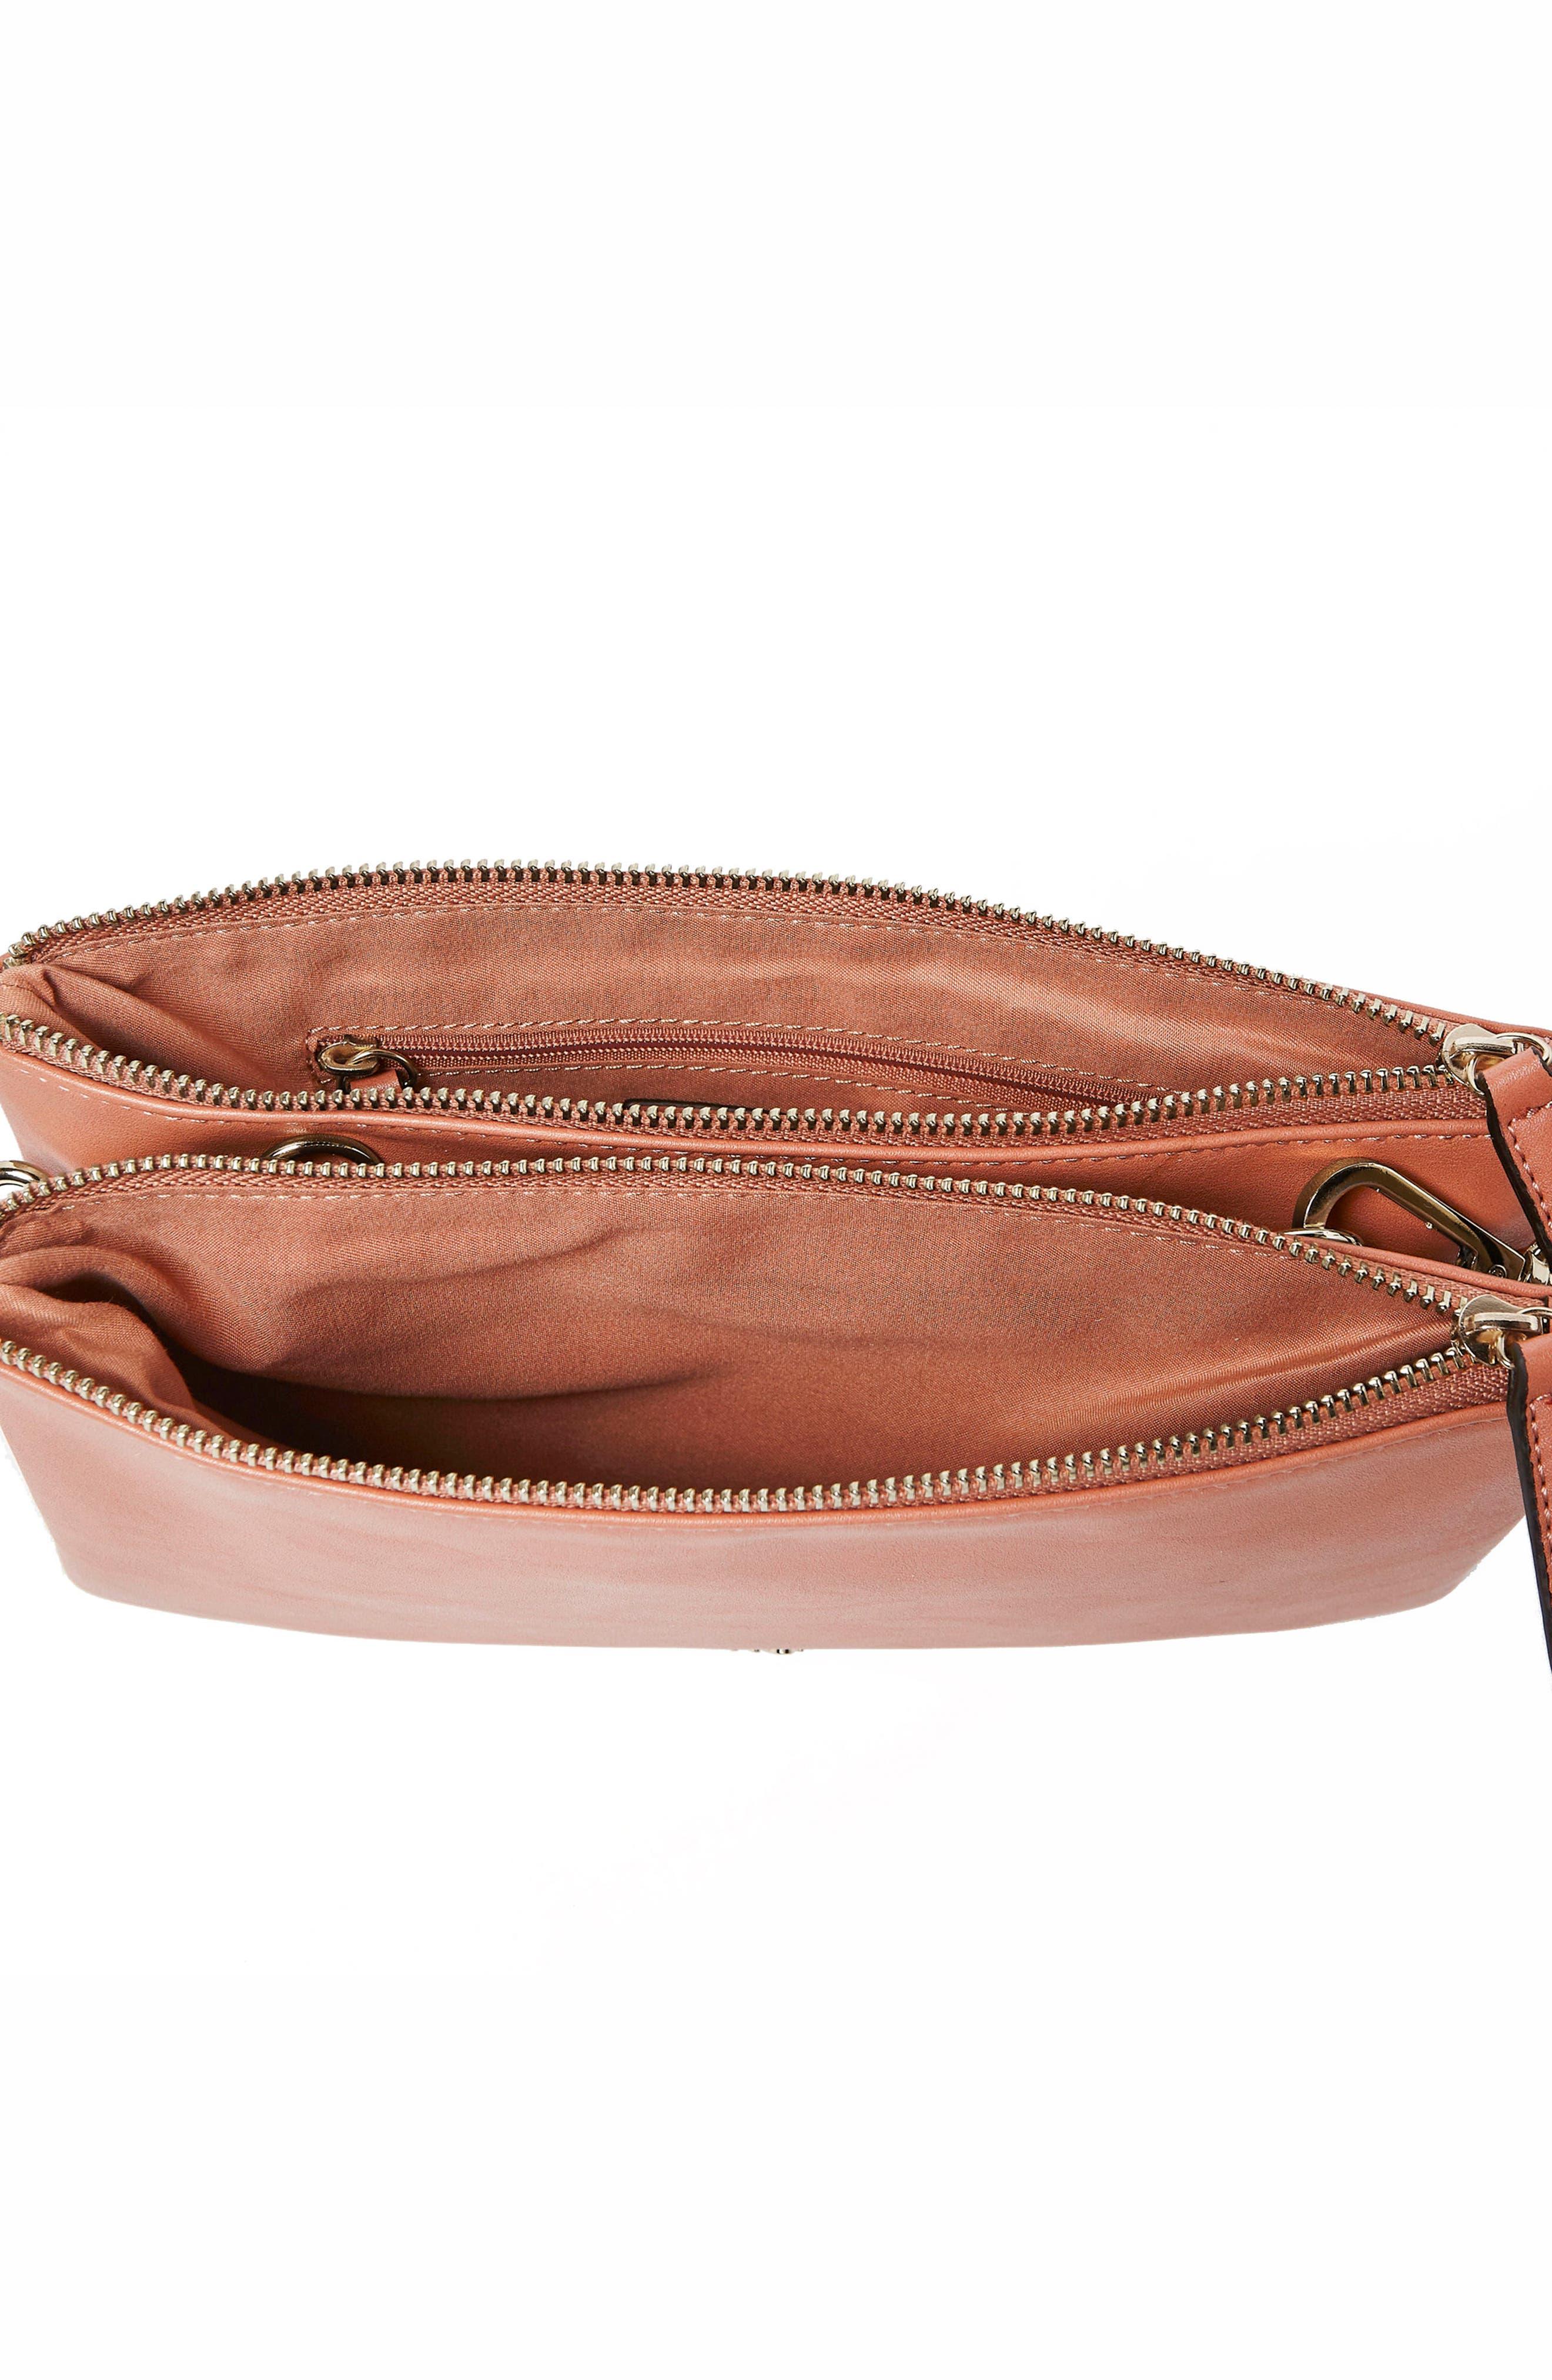 The Enchanted Vegan Leather Crossbody Bag,                             Alternate thumbnail 3, color,                             Rose Pink